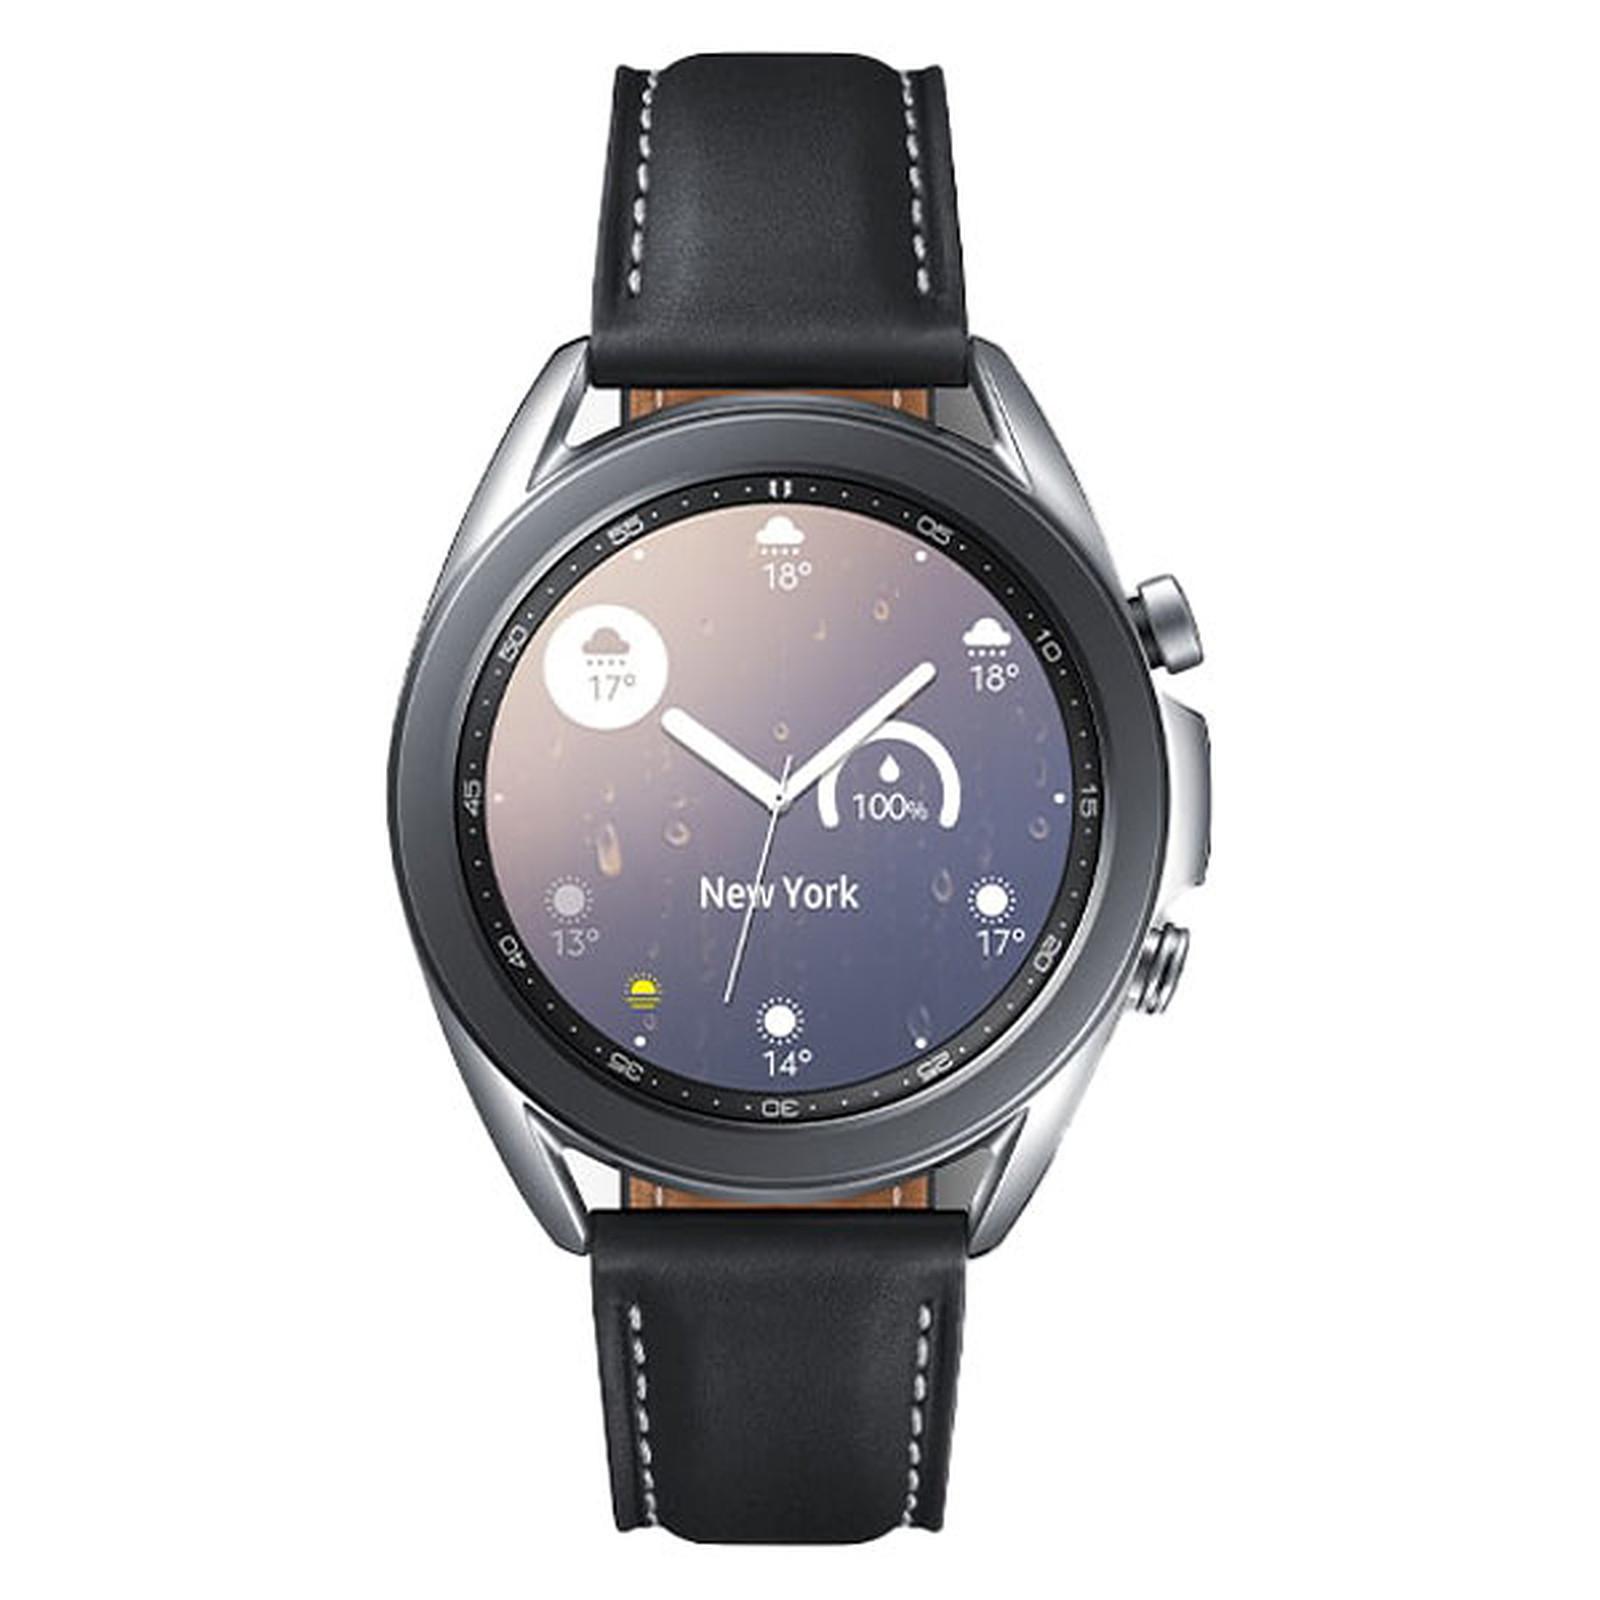 Reloj Smartwatch Samsung Galaxy 3 4G (41 mm / Plata)